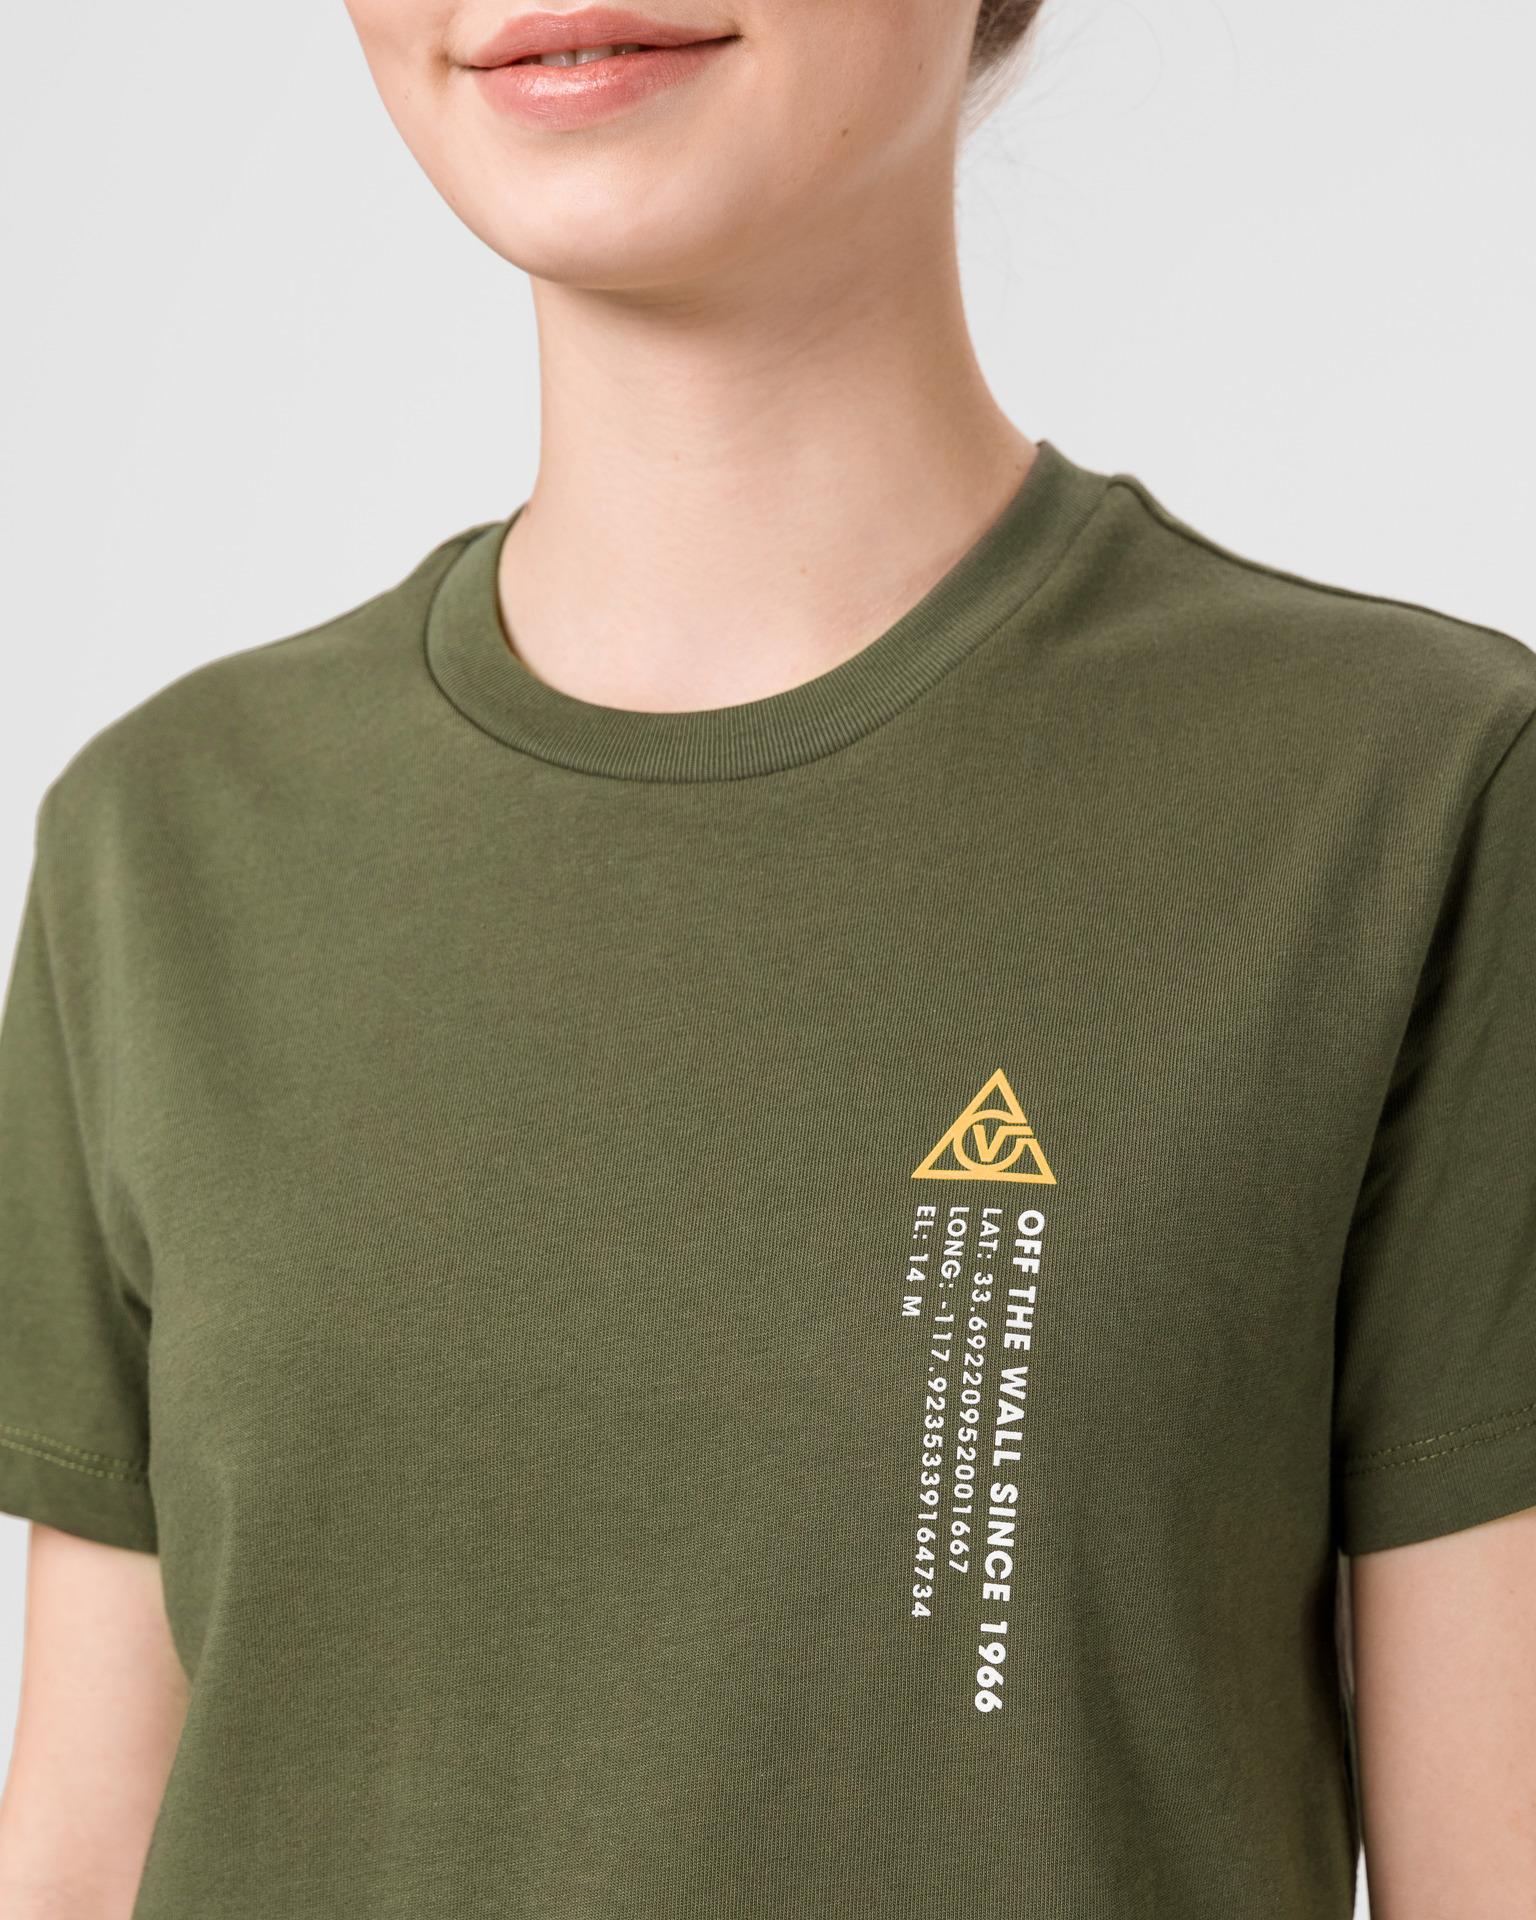 Vans zielony koszulka 66 Supply Tri